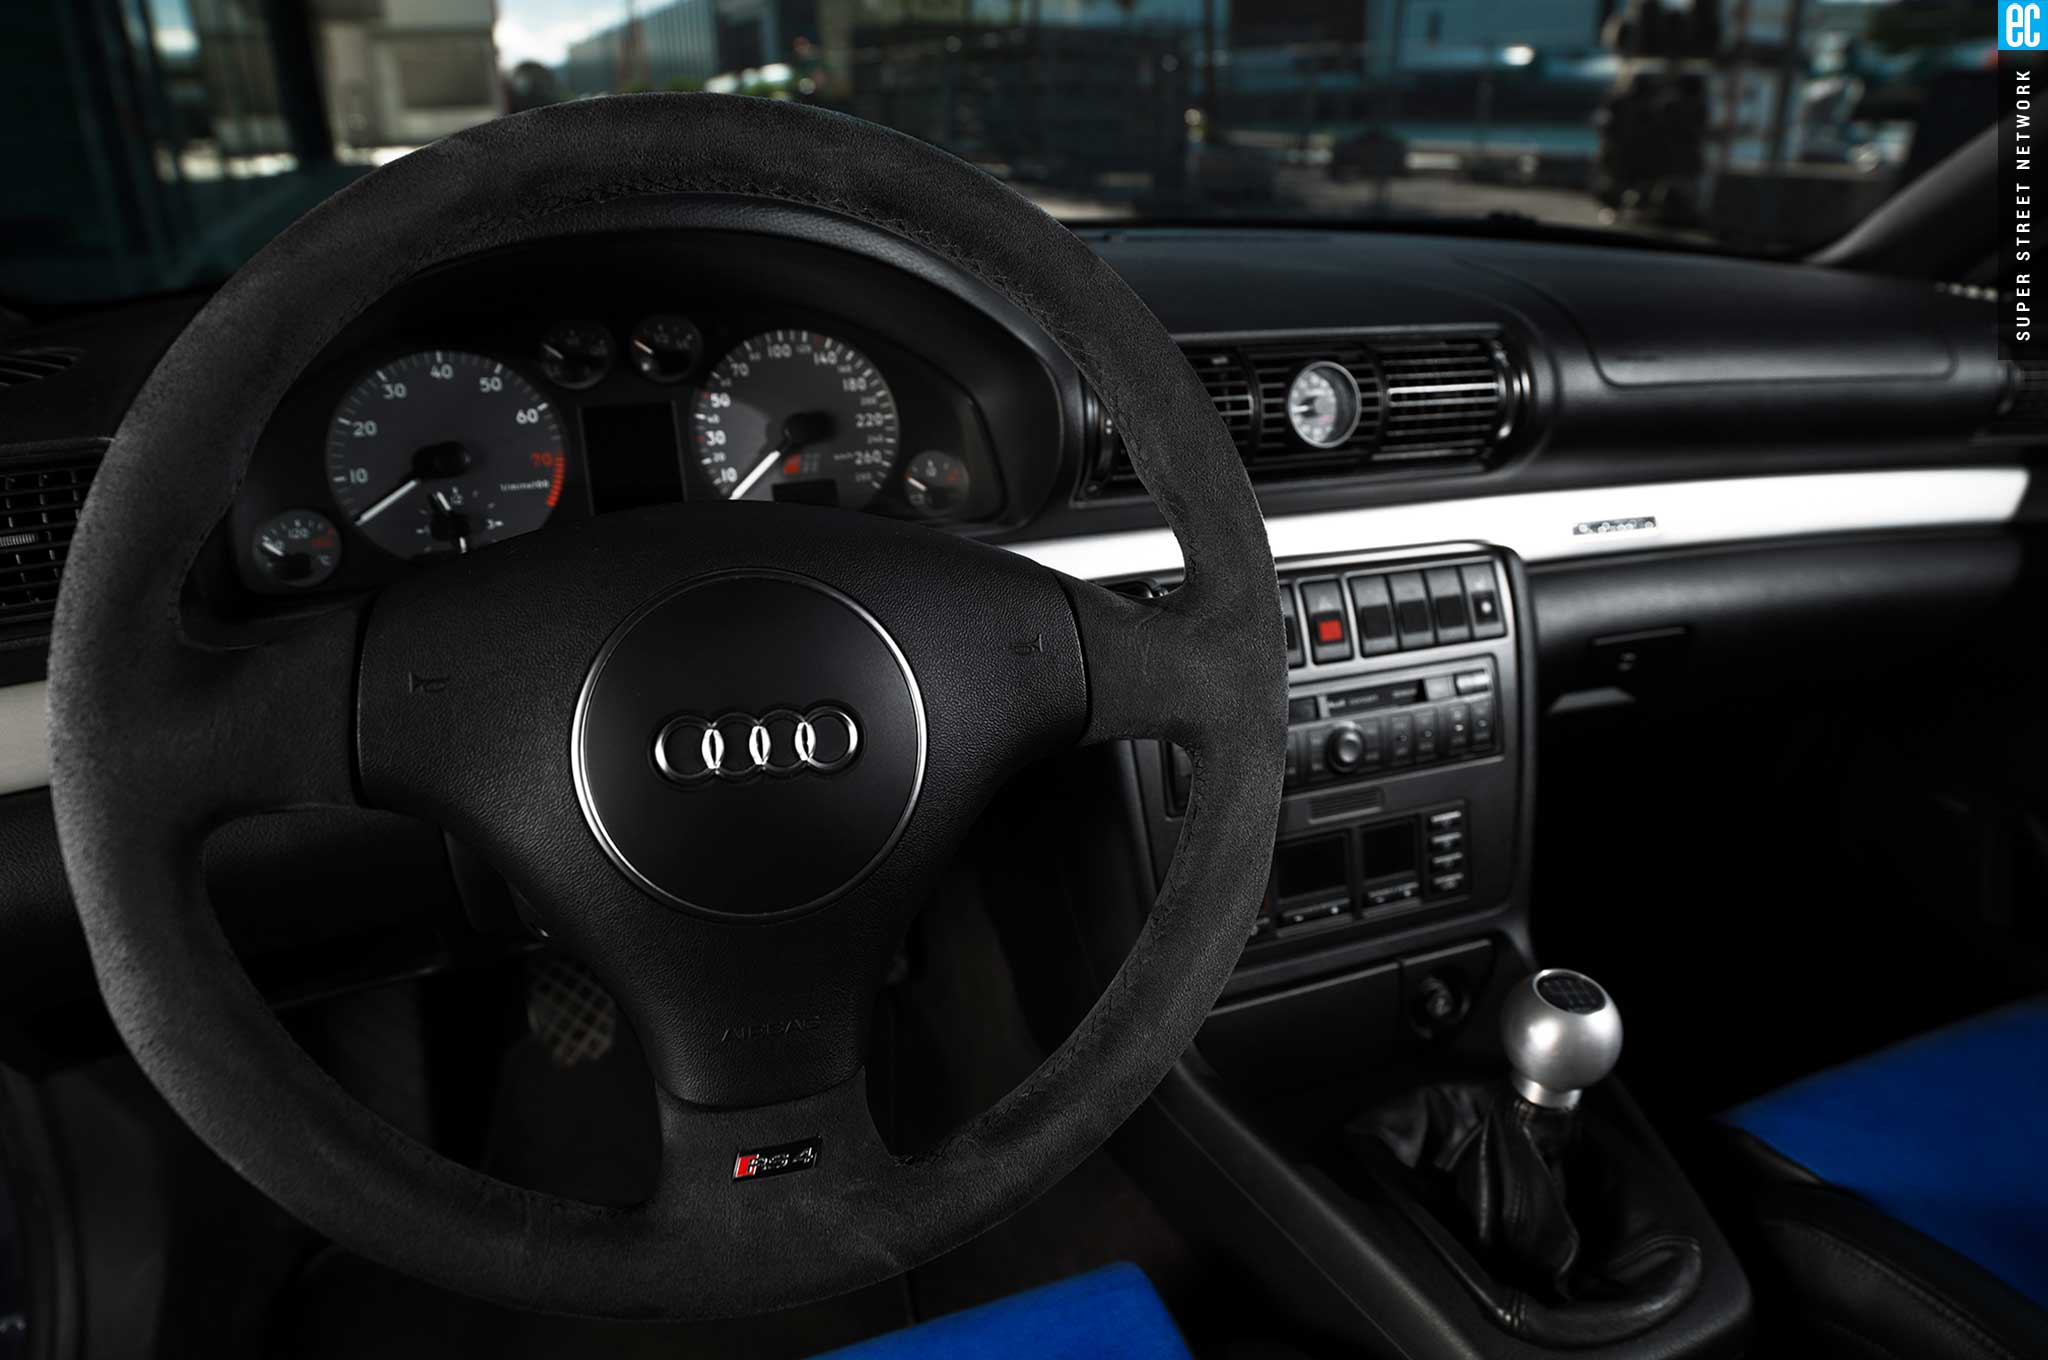 Building The B5 Generation Audi Rs4 Sedan That Audi Never